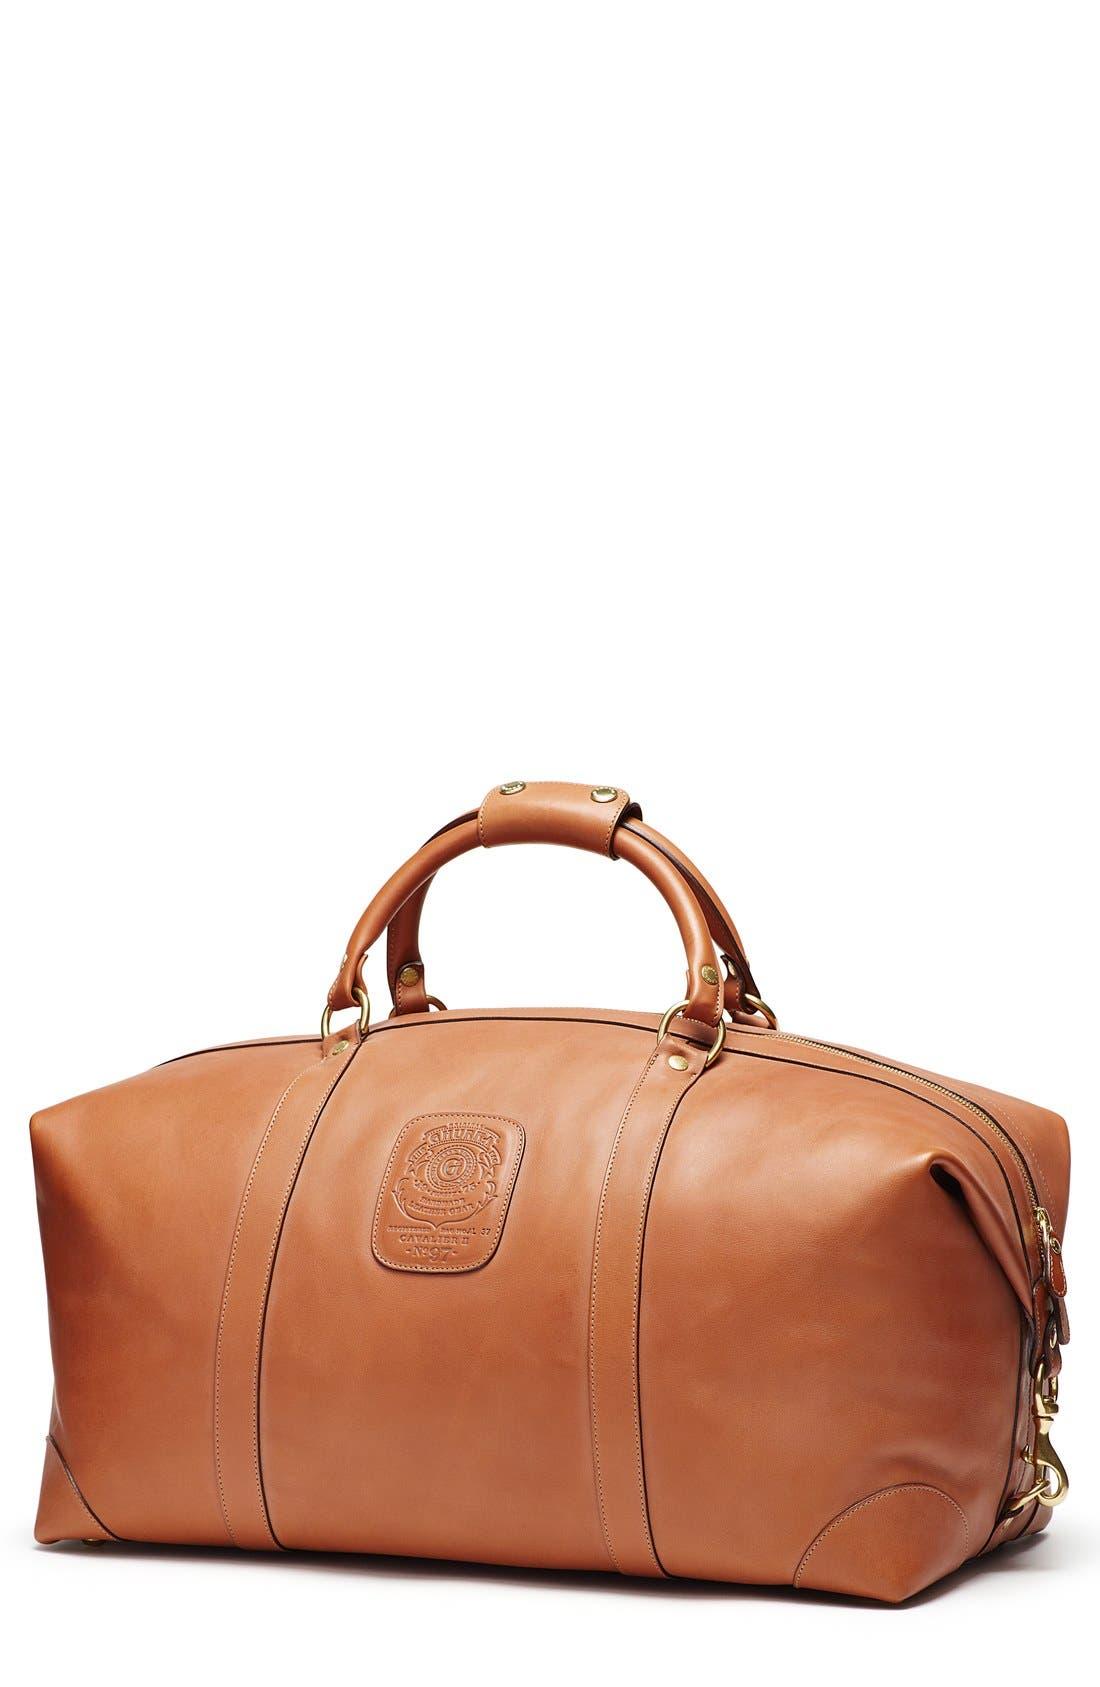 Ghurka Cavalier II Leather Duffel Bag